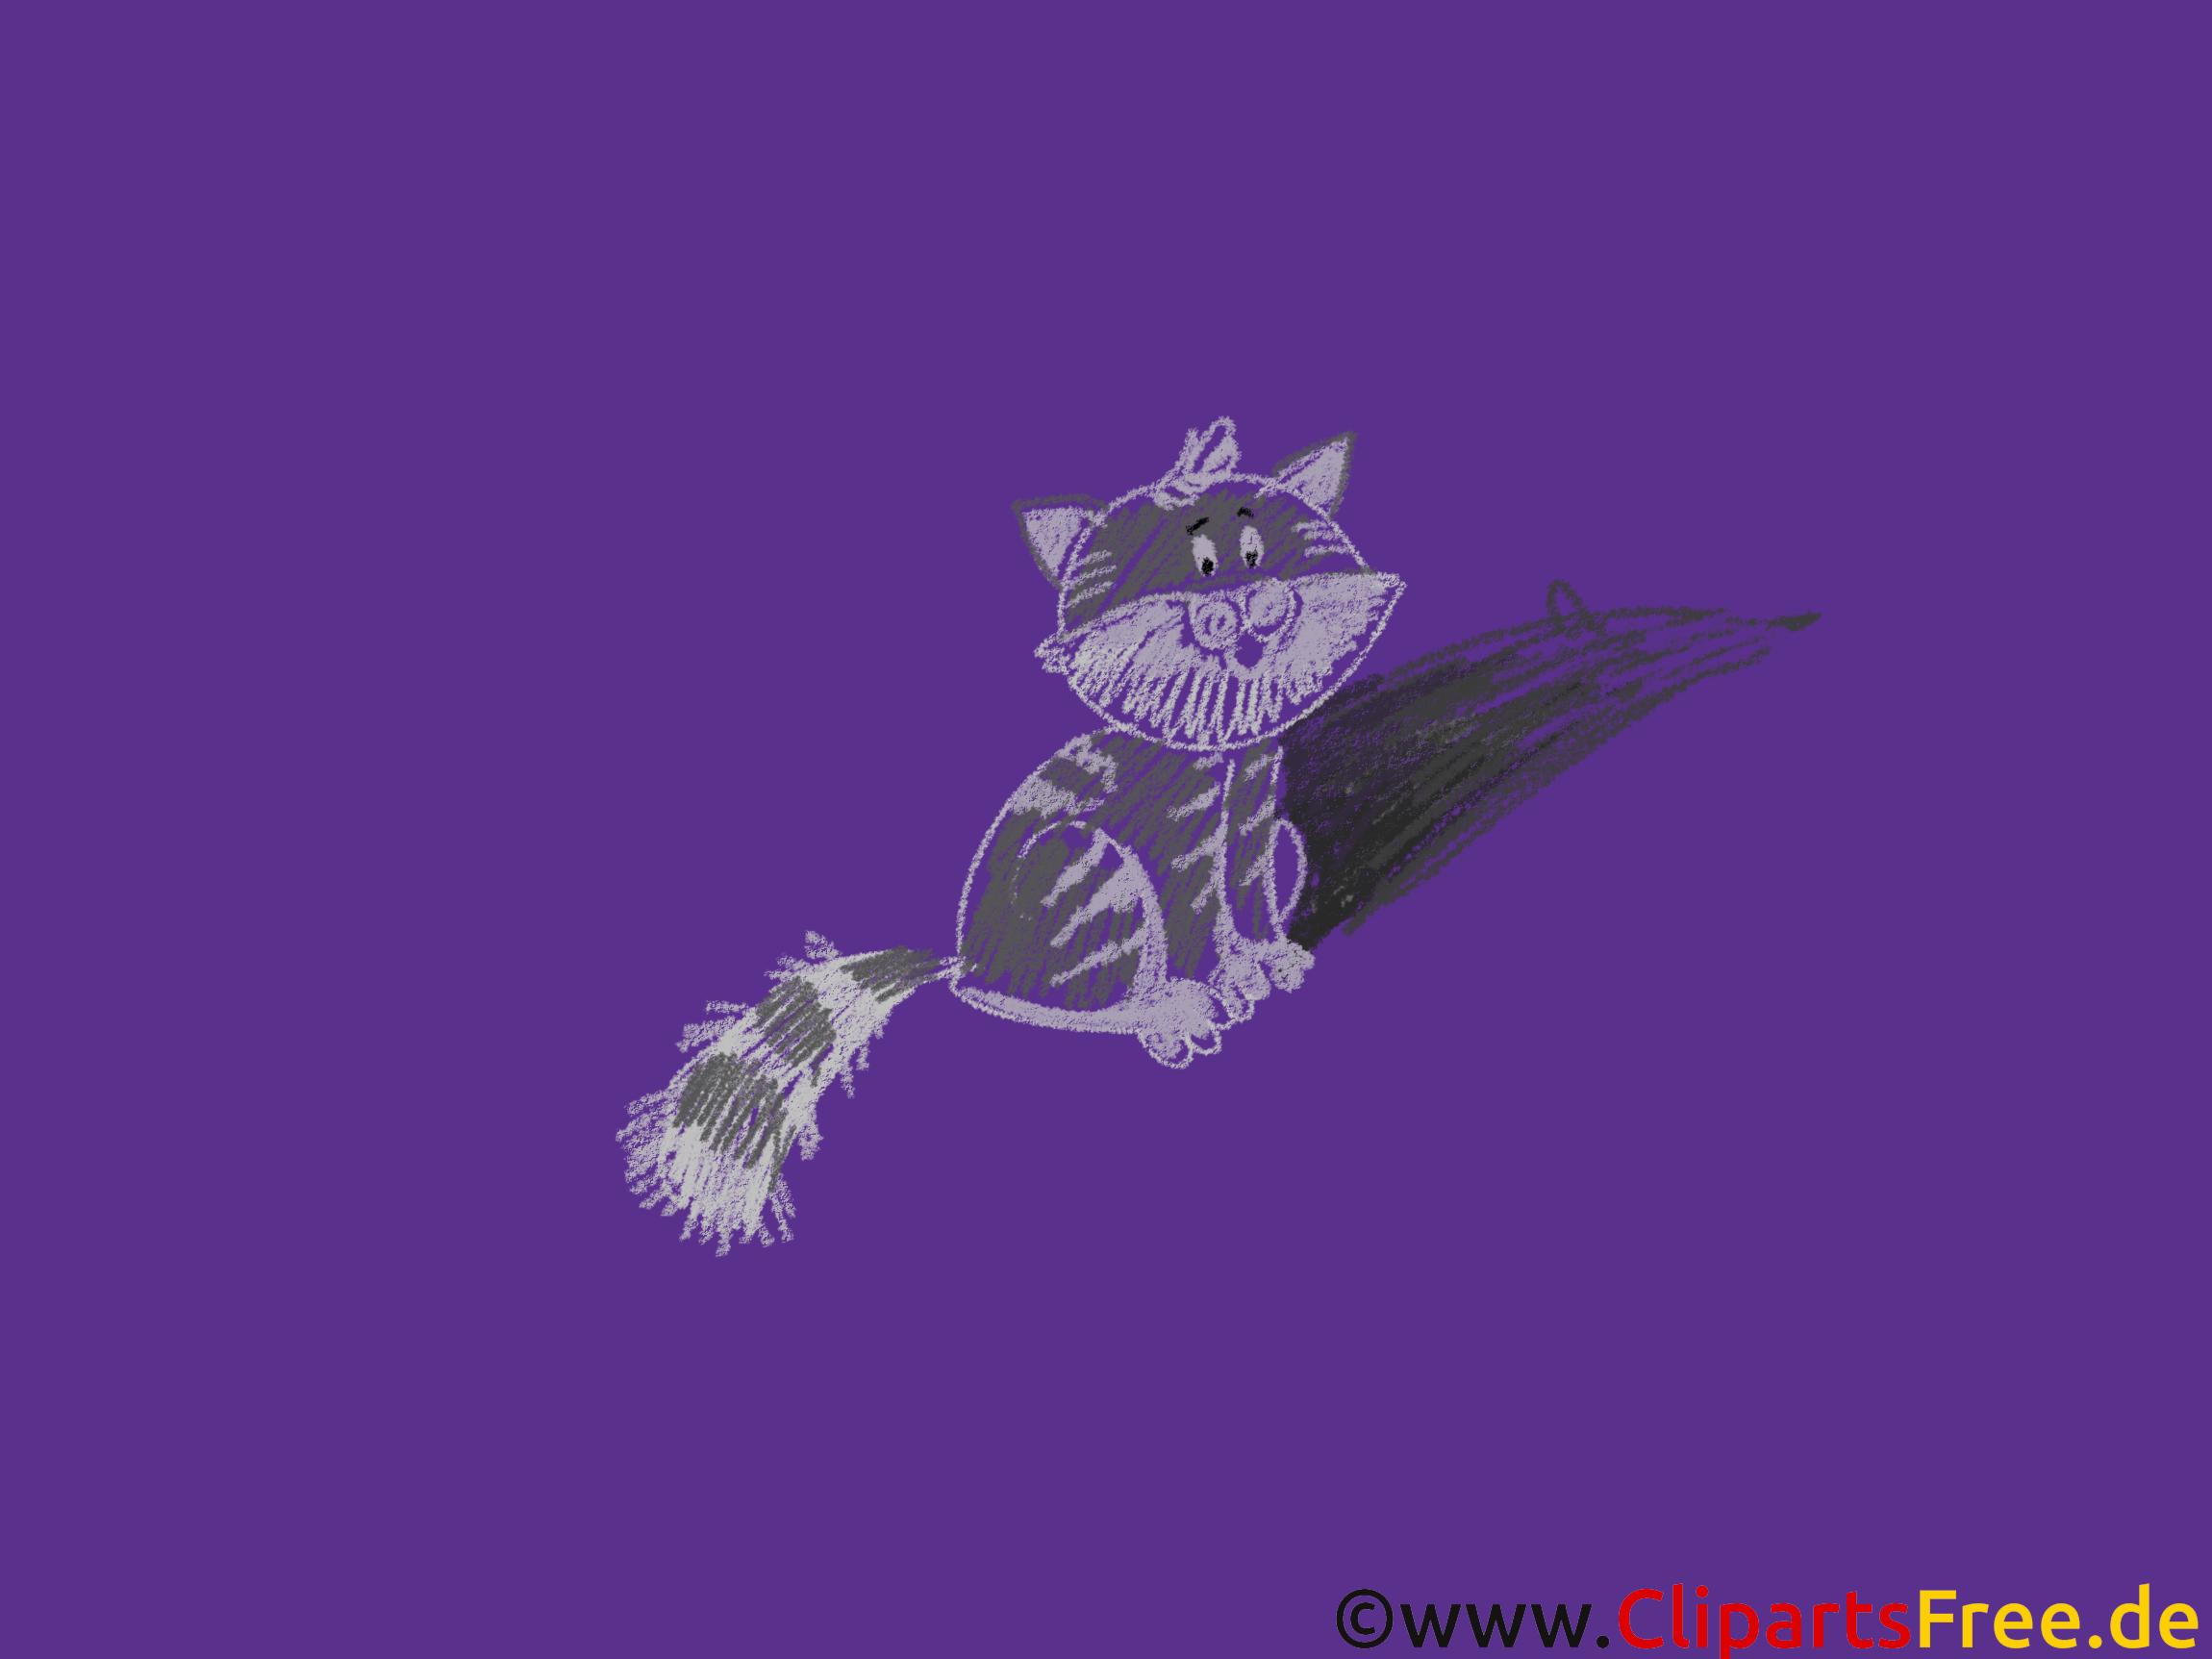 Gute Hintergrundbilder - Schwarze Katze